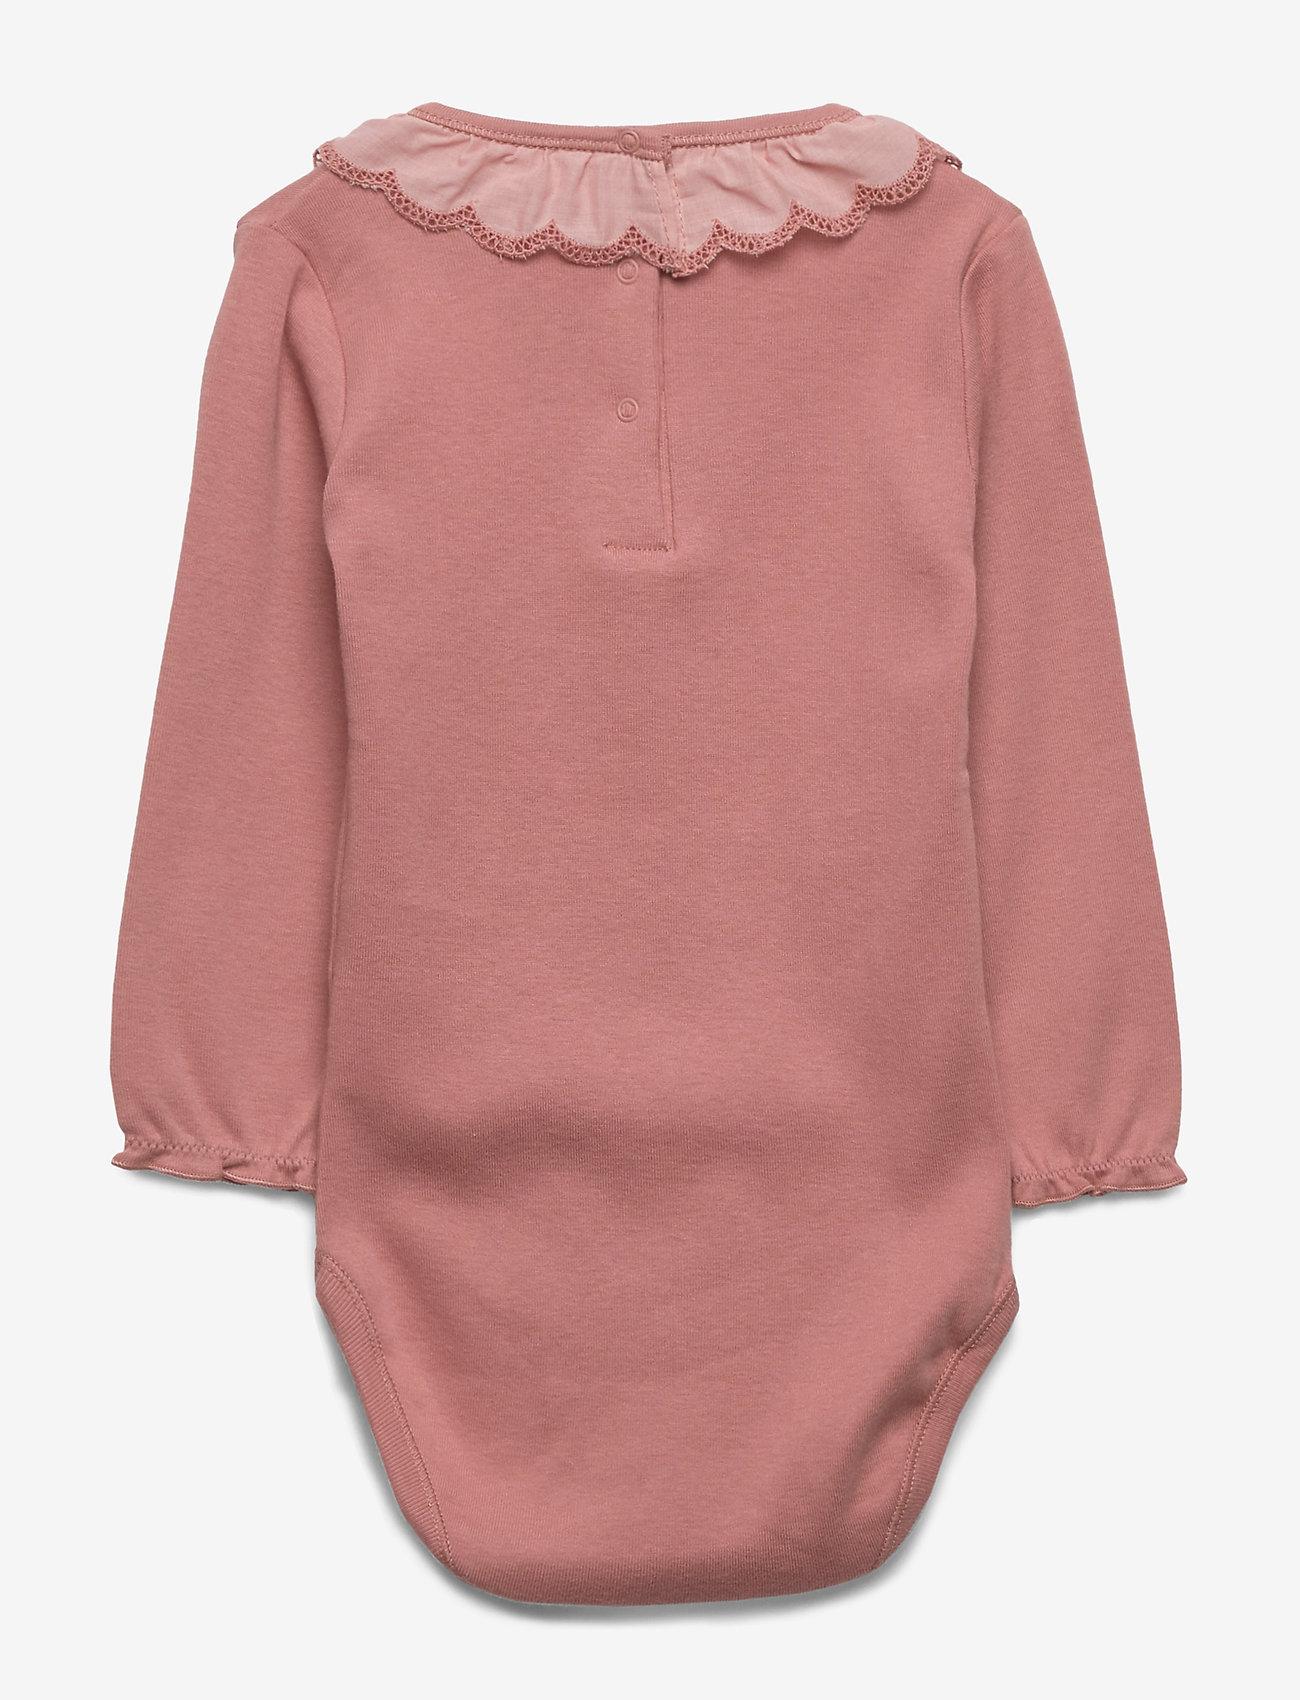 Noa Noa Miniature - Baby Body - long-sleeved - dusty rose - 1